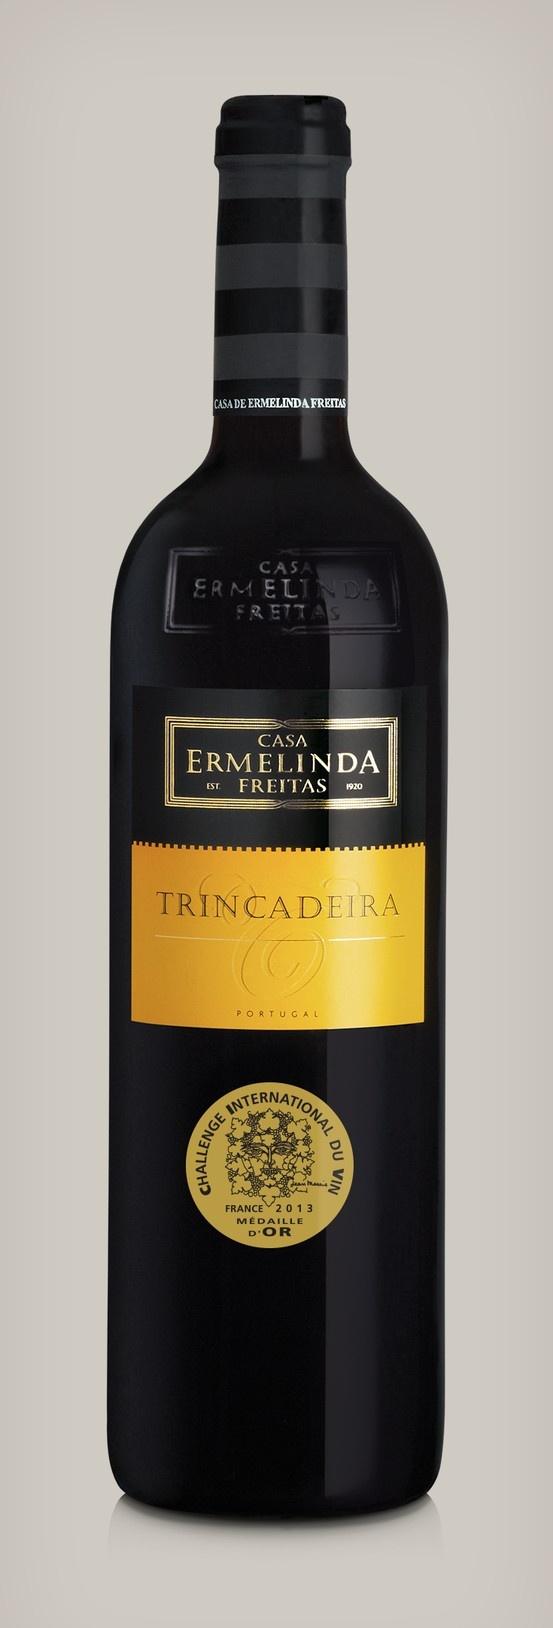 Casa Ermelinda Freitas Trincadeira 2010. (Setúbal region) Challenge Internatinal Du Vin Gold Medal Winner.